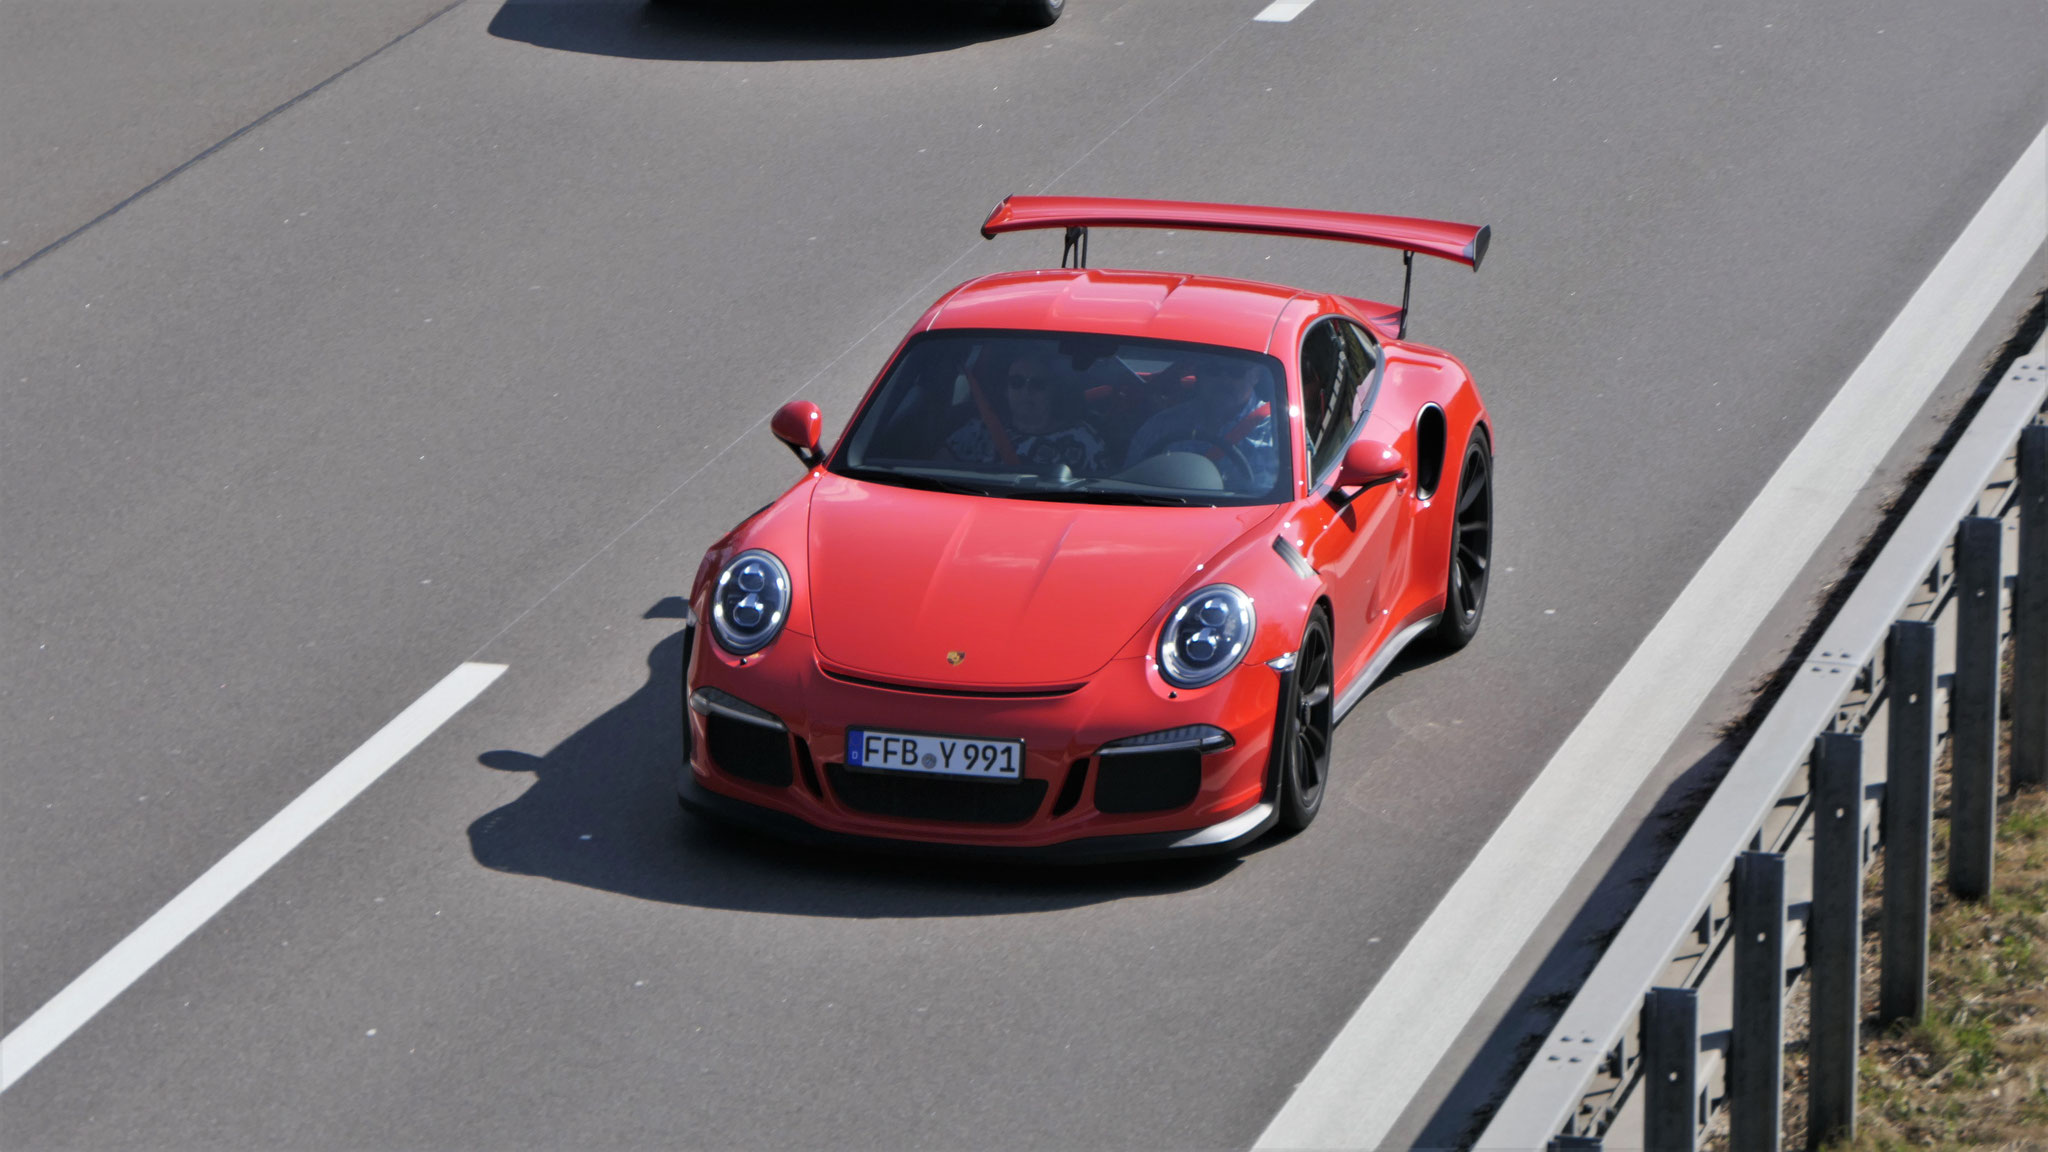 Porsche 911 GT3 RS - FFB-Y-991